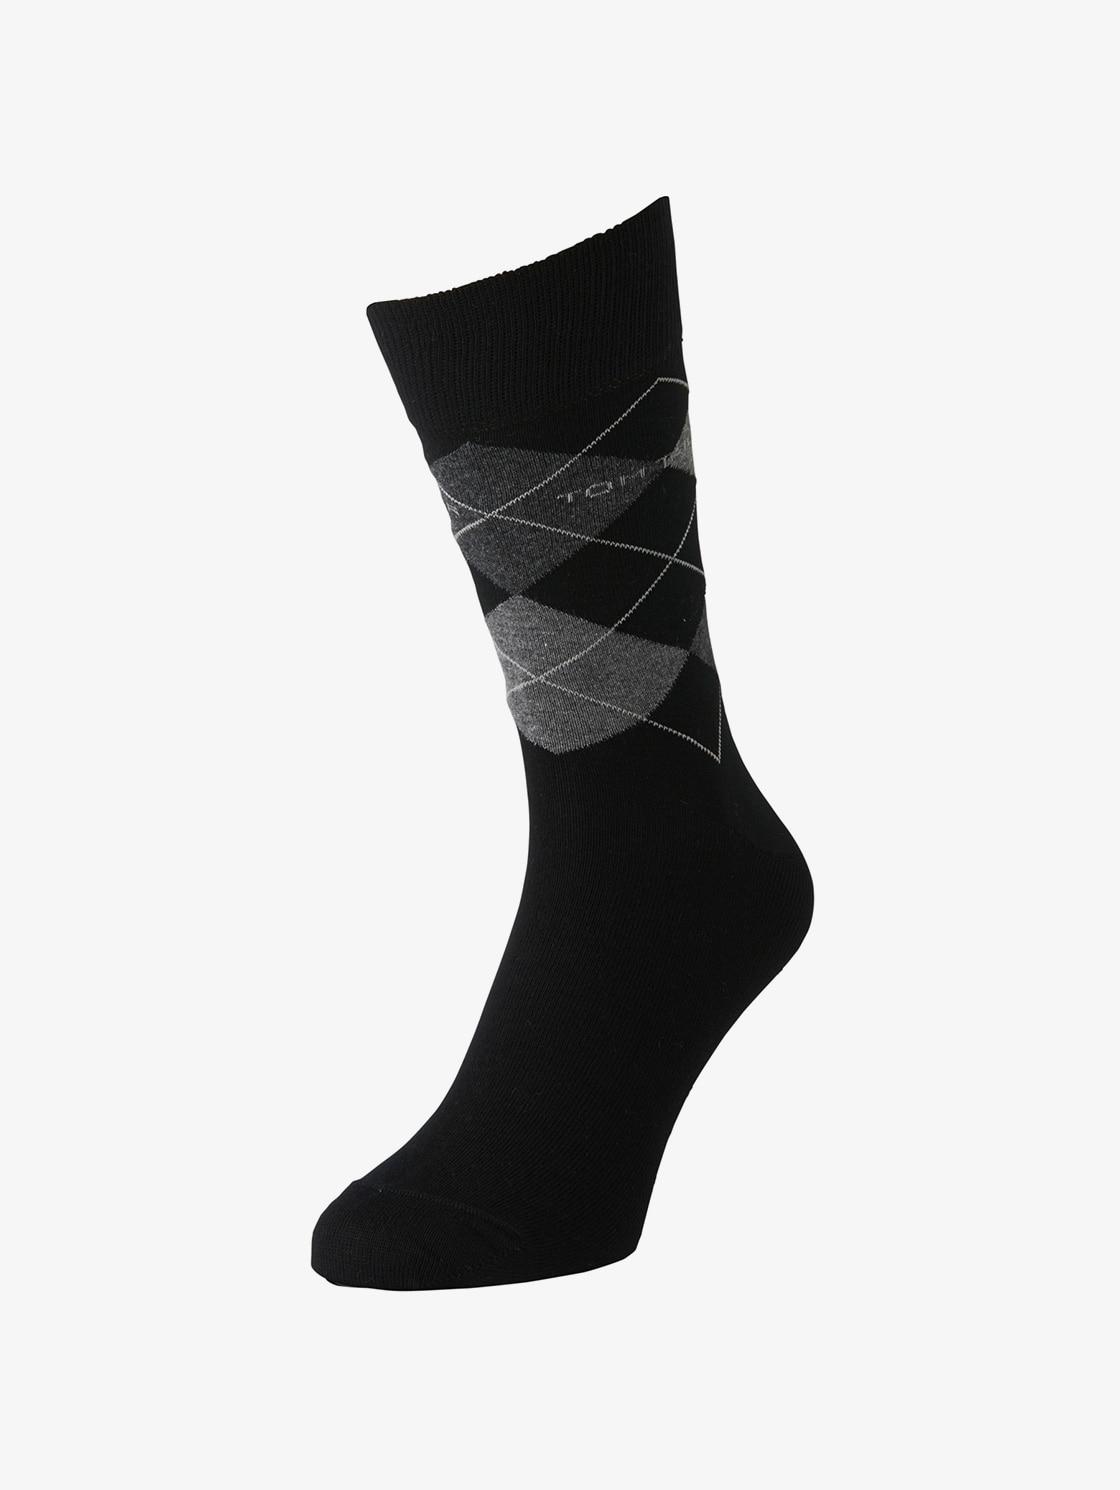 Tom Tailor Casual Socken im Doppel Pack, Herren, black, Größe: 39 42